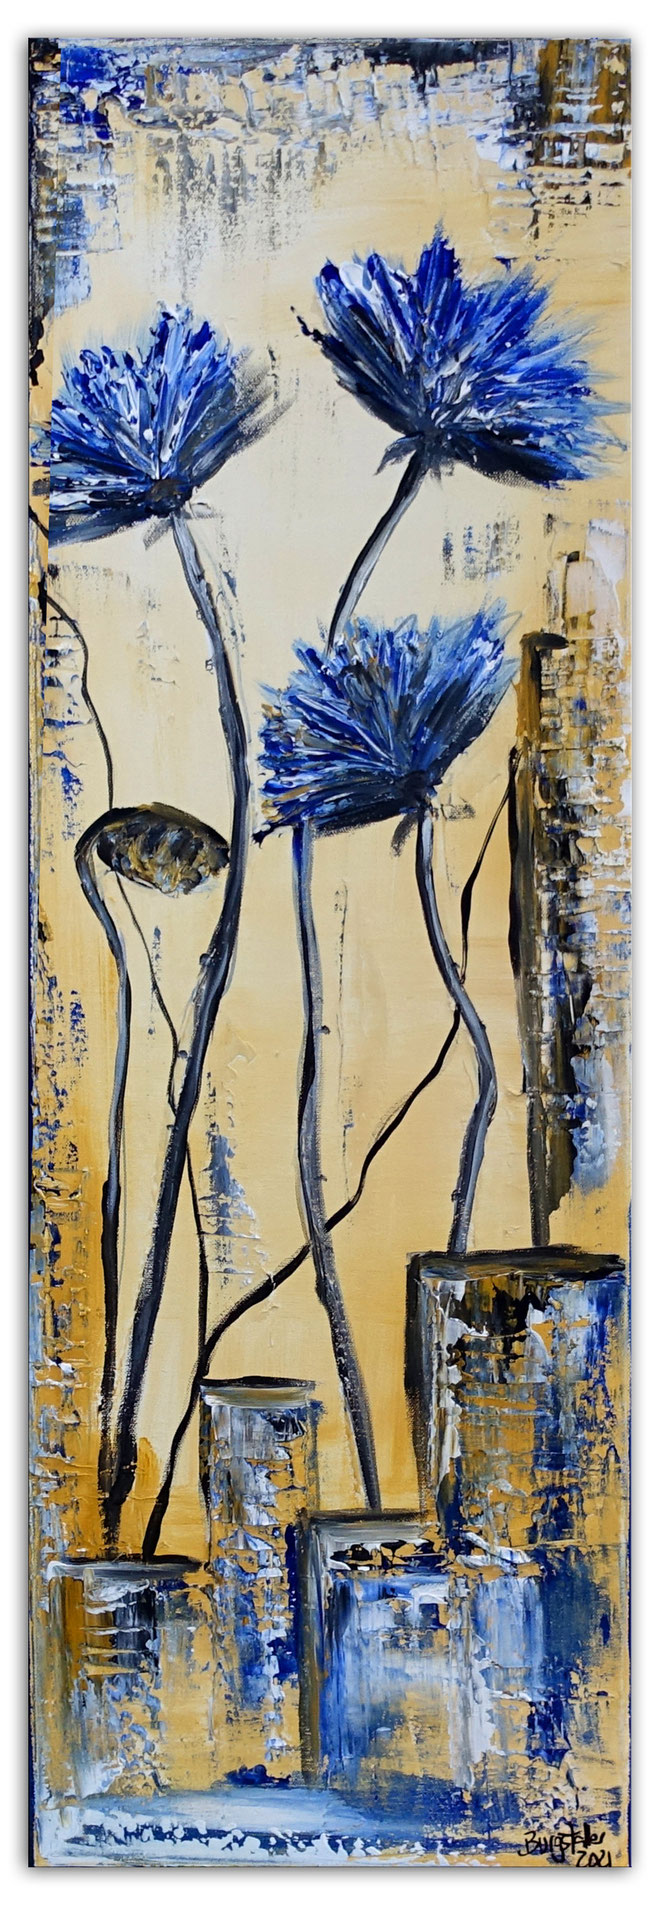 3 Gelbe Blüten Blumen Malerei Acryl Wandbild Blumenbild handgemalt